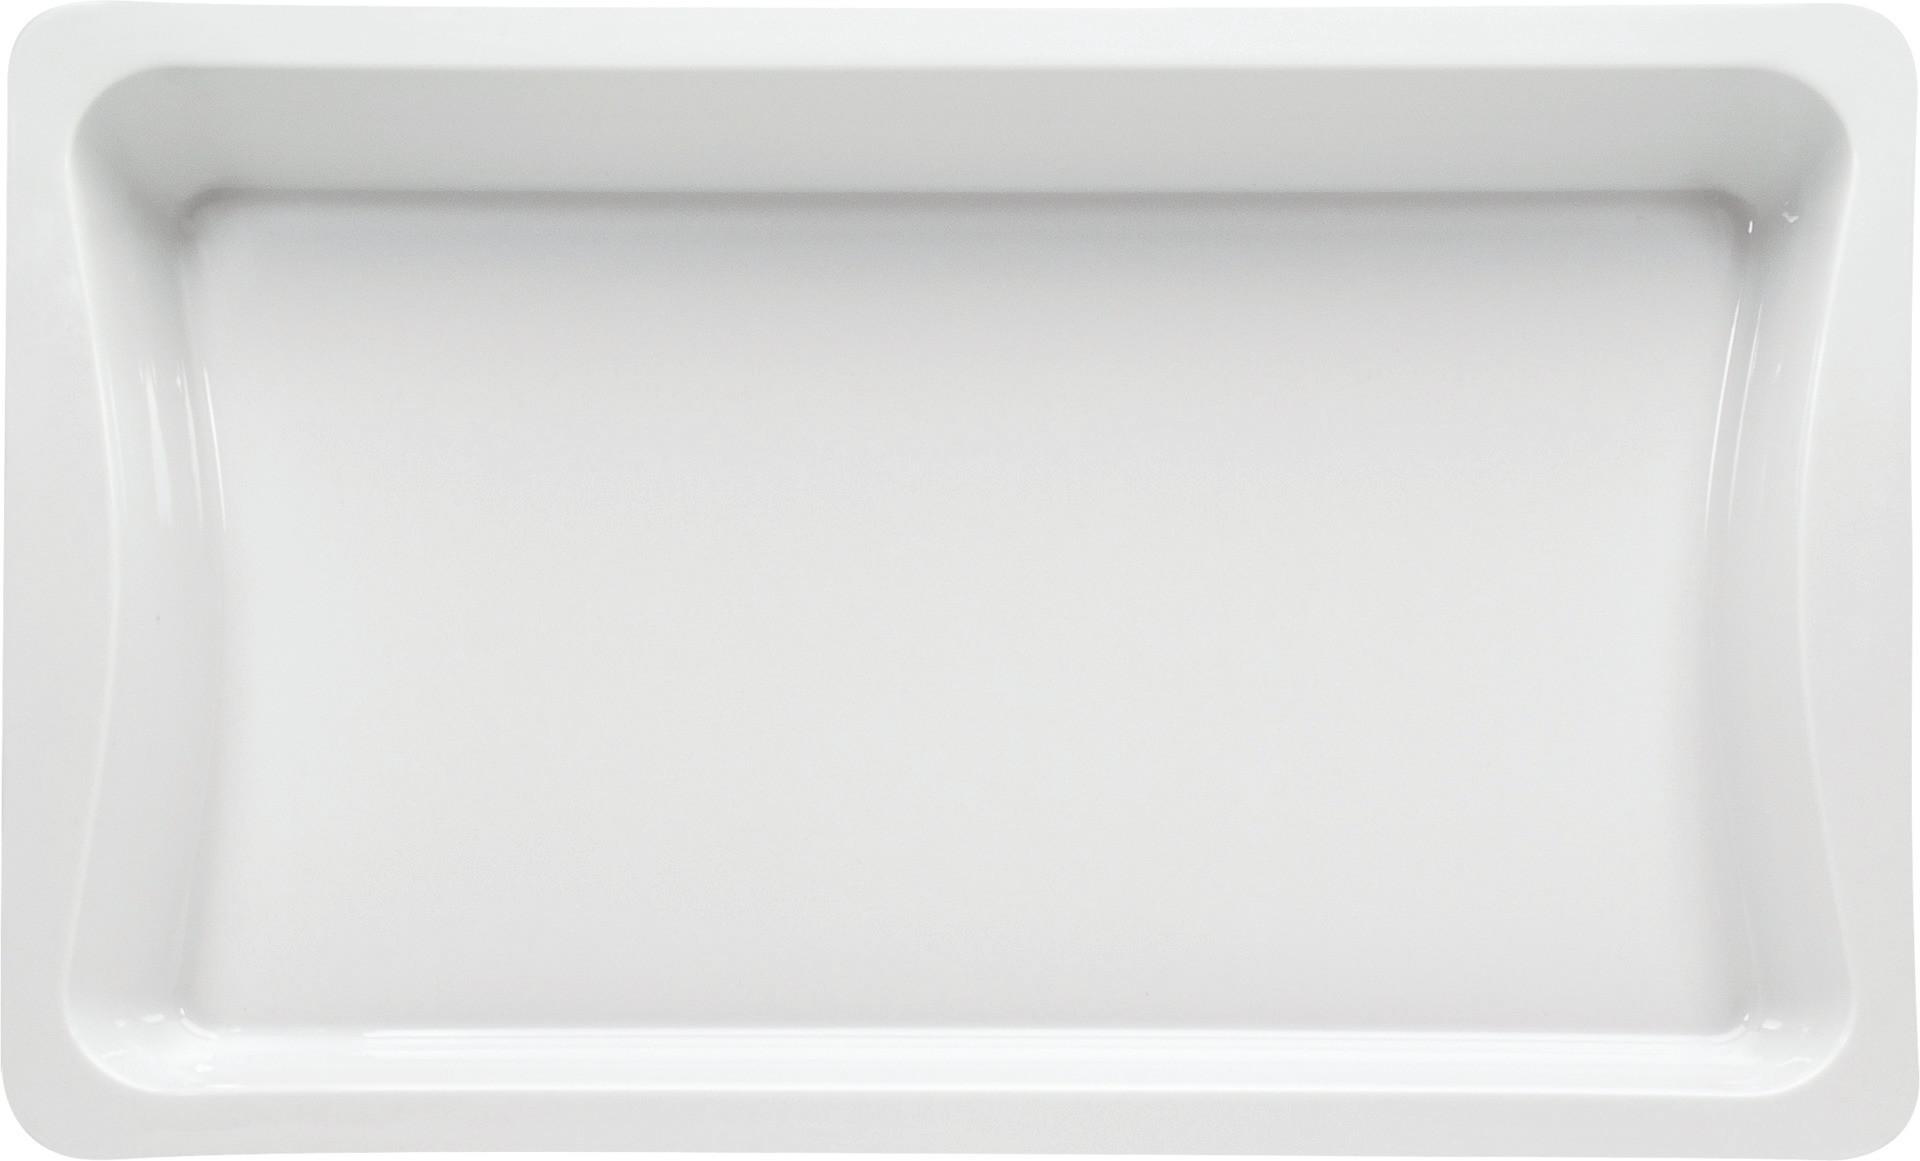 Emotion, GN-Schale GN 1/1 530 x 325 x 20 mm